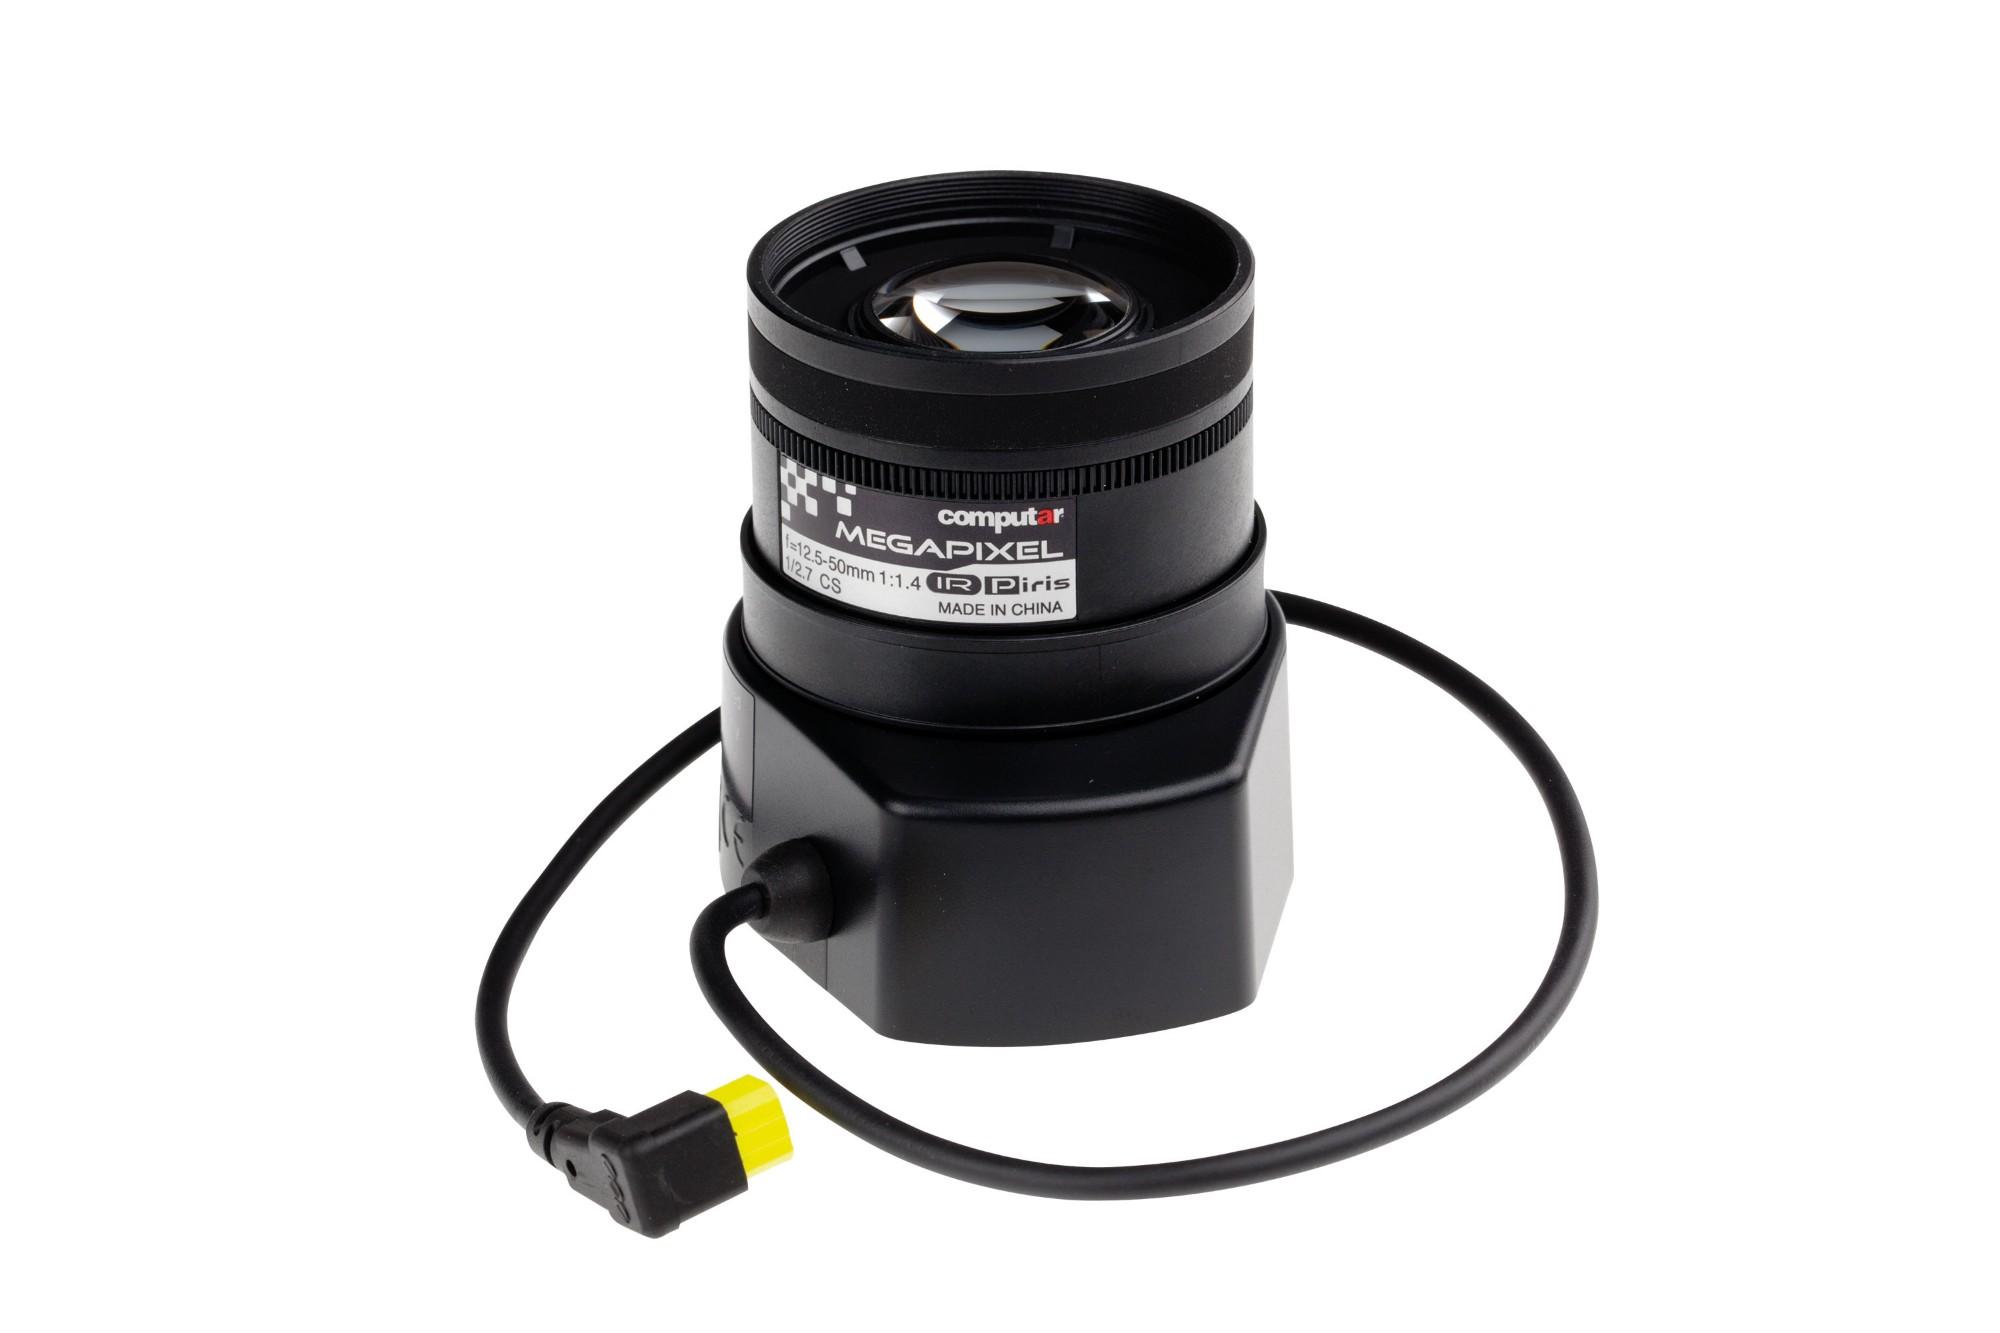 Axis 5800-791 lente de cámara Cámara IP Teleobjetivo Negro